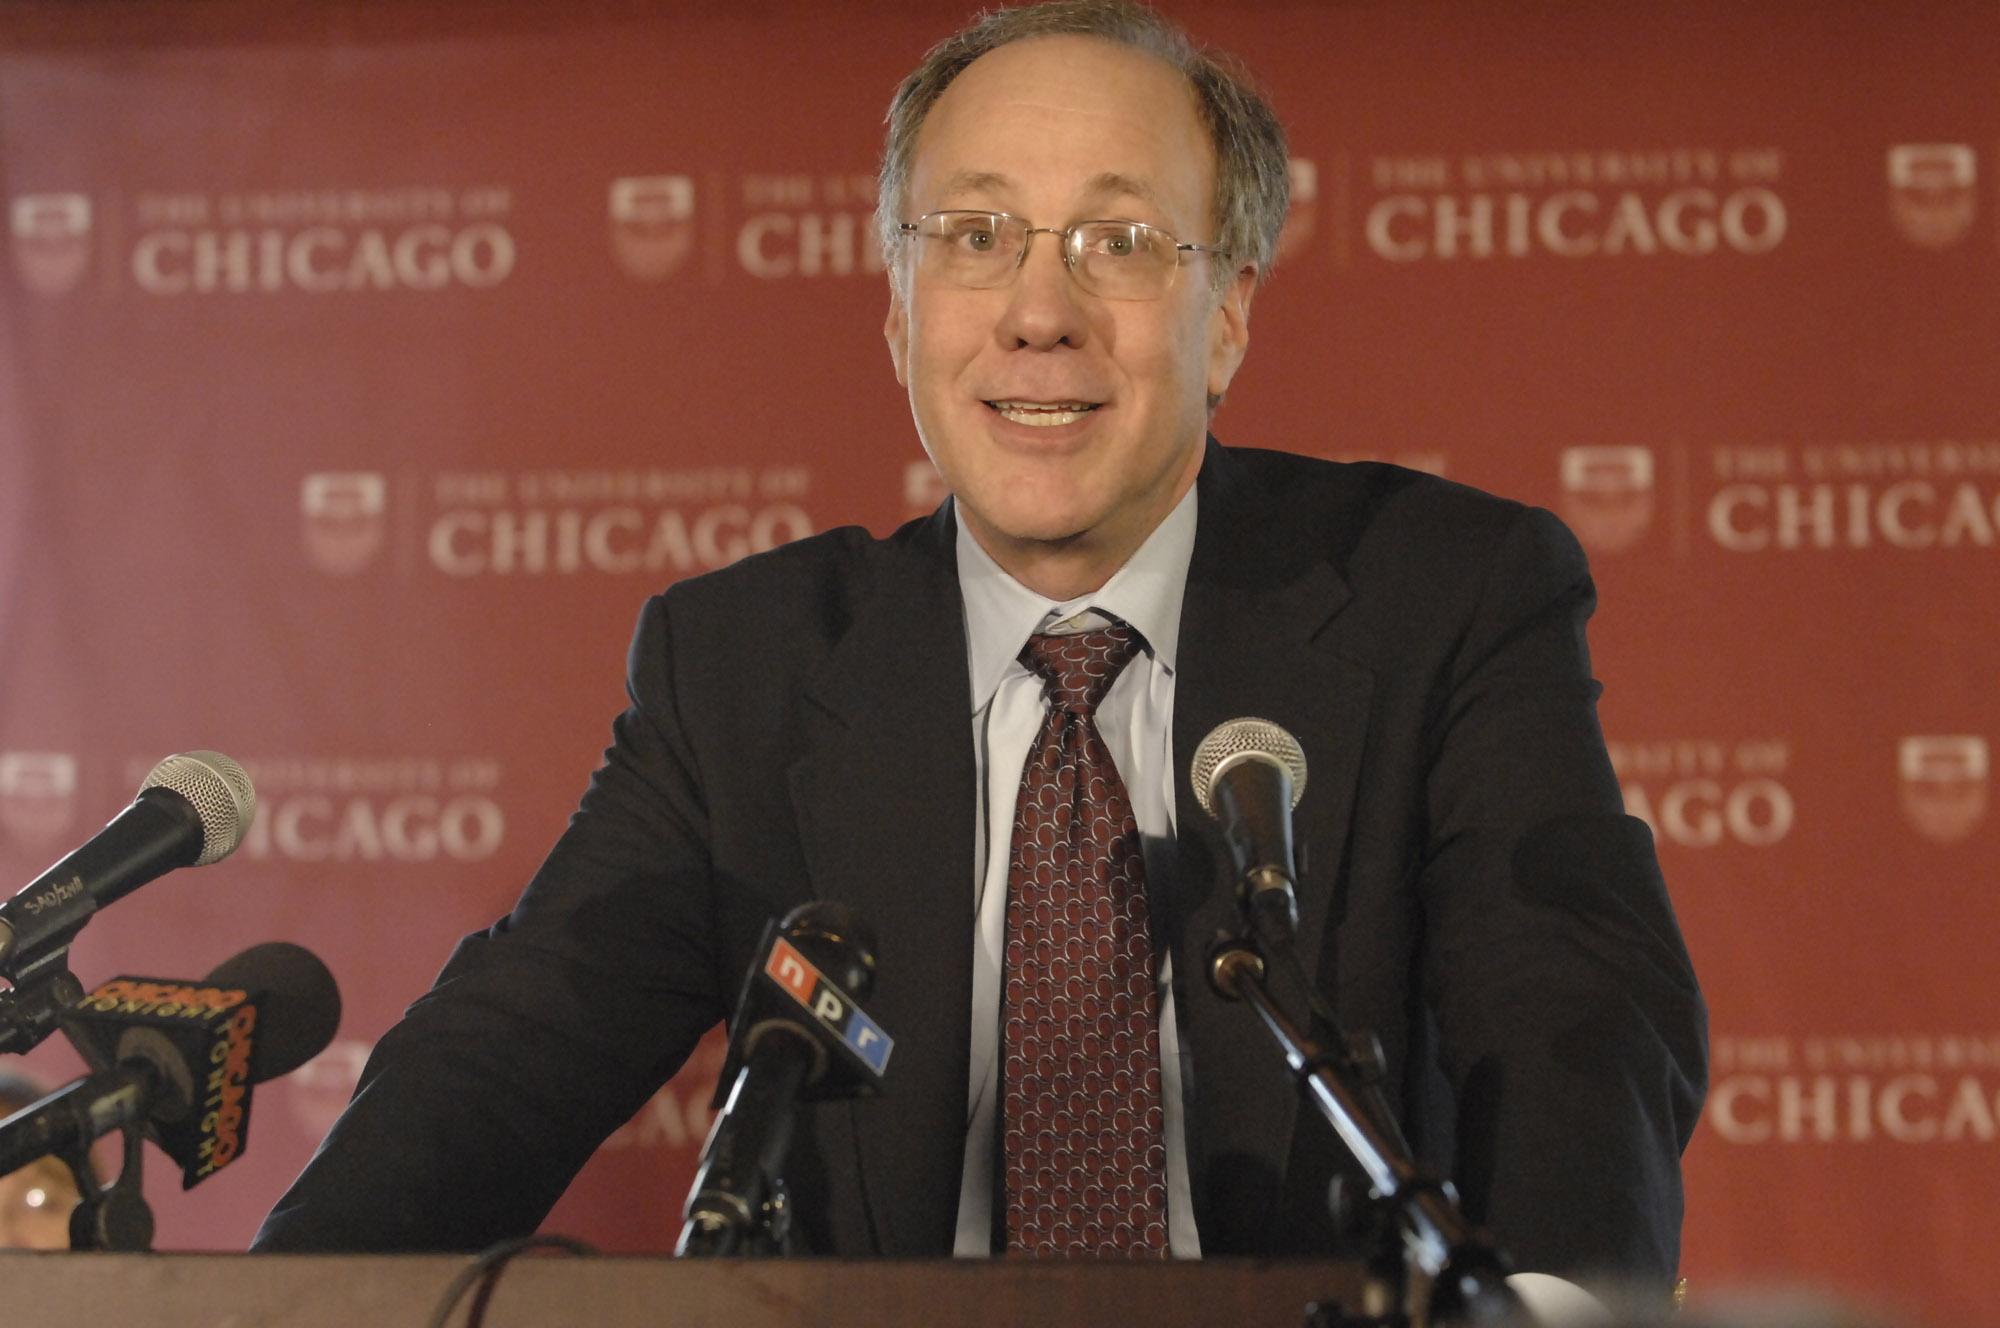 Roger Myerson wins Nobel Memorial Prize in Economics, 15 Oct 2007 |Lloyd DeGrane